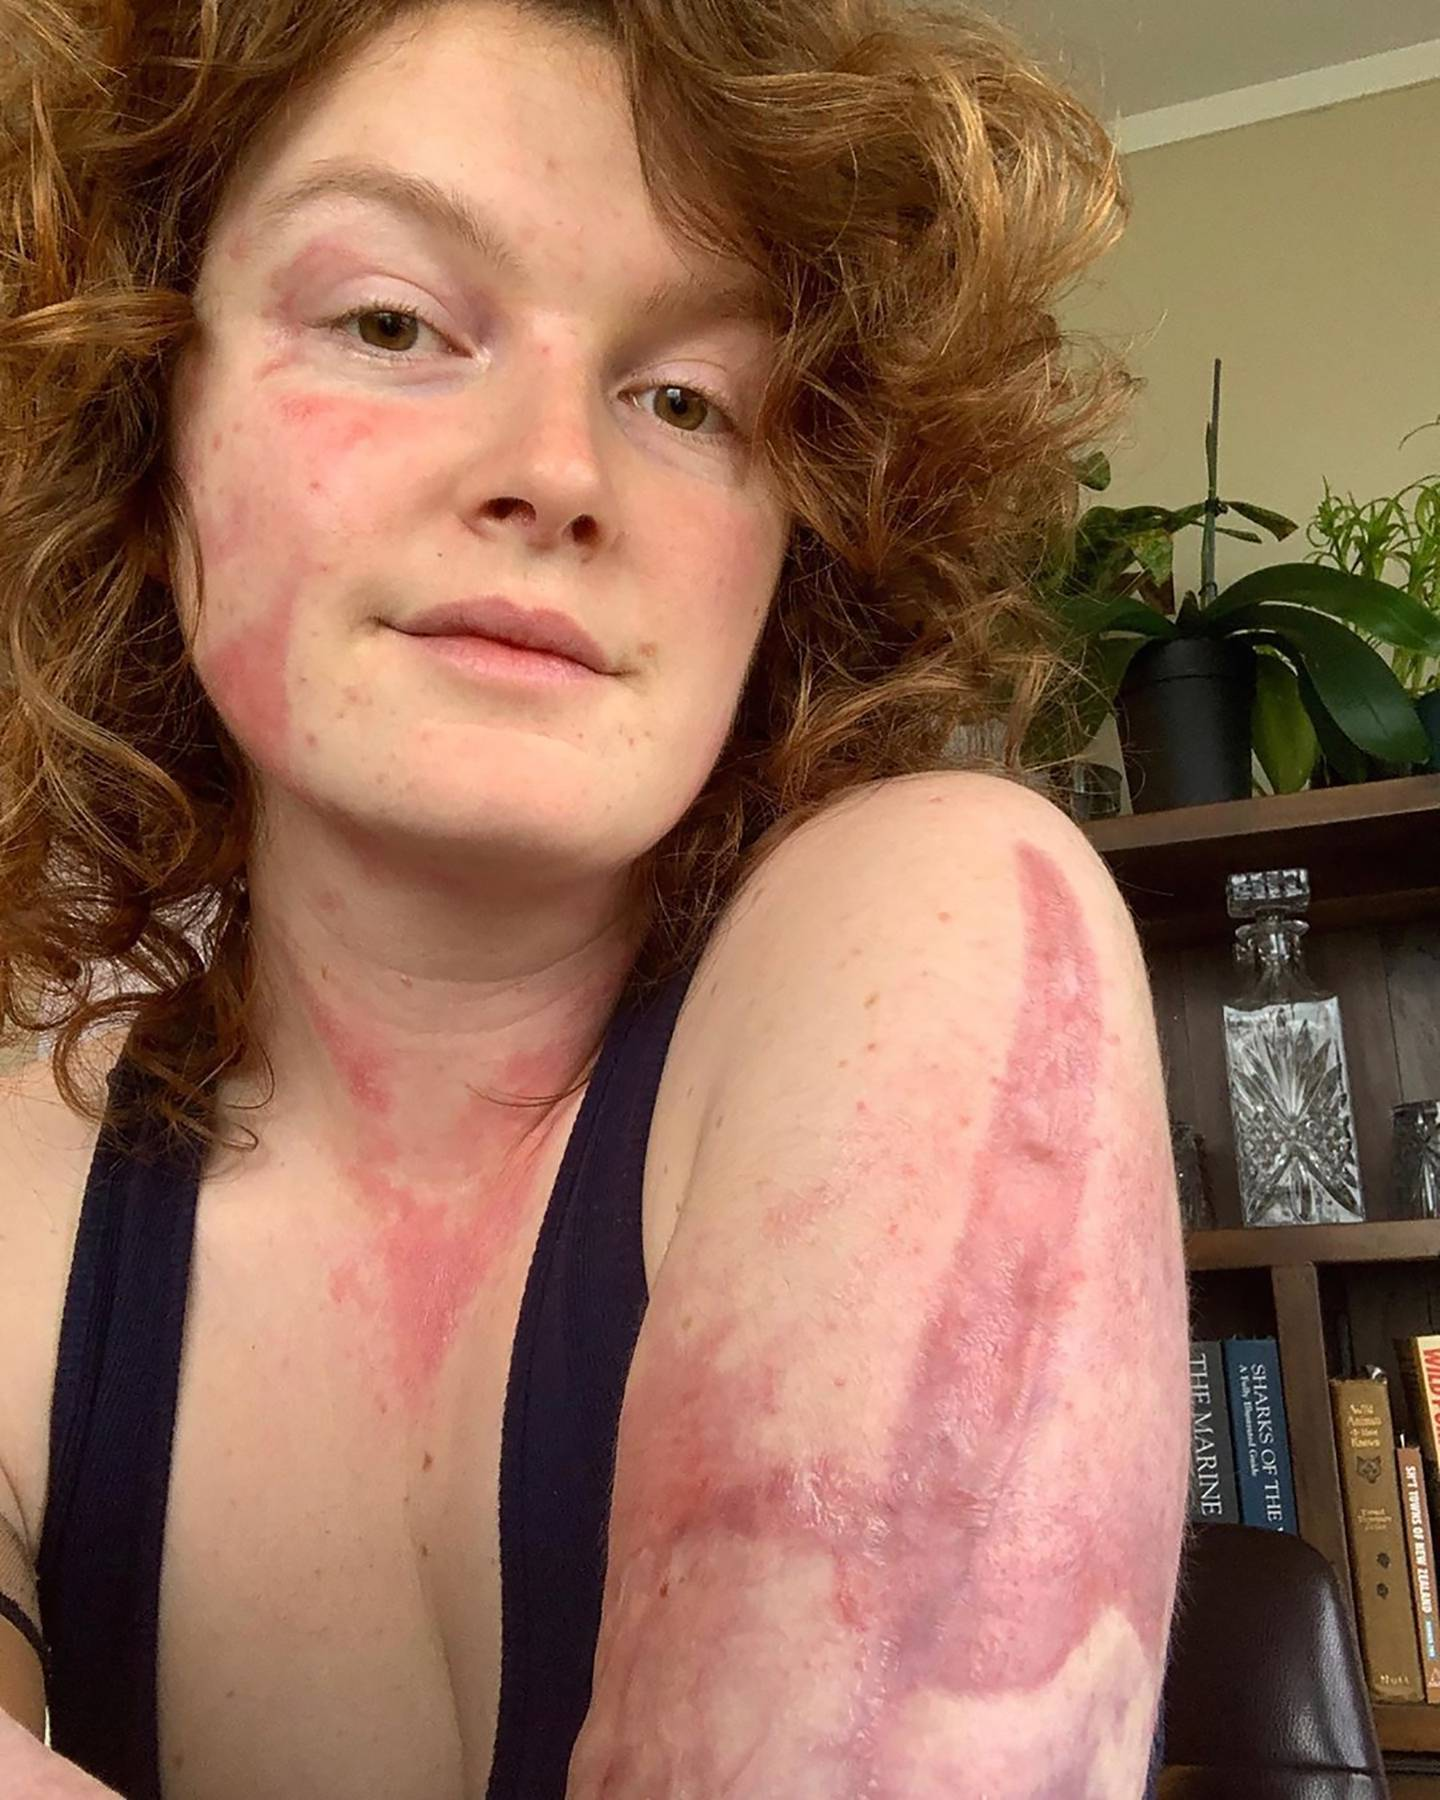 Kelsey Waghorn, survivor from the Whakaari White Island volcanic eruption from 10 December 2019,...